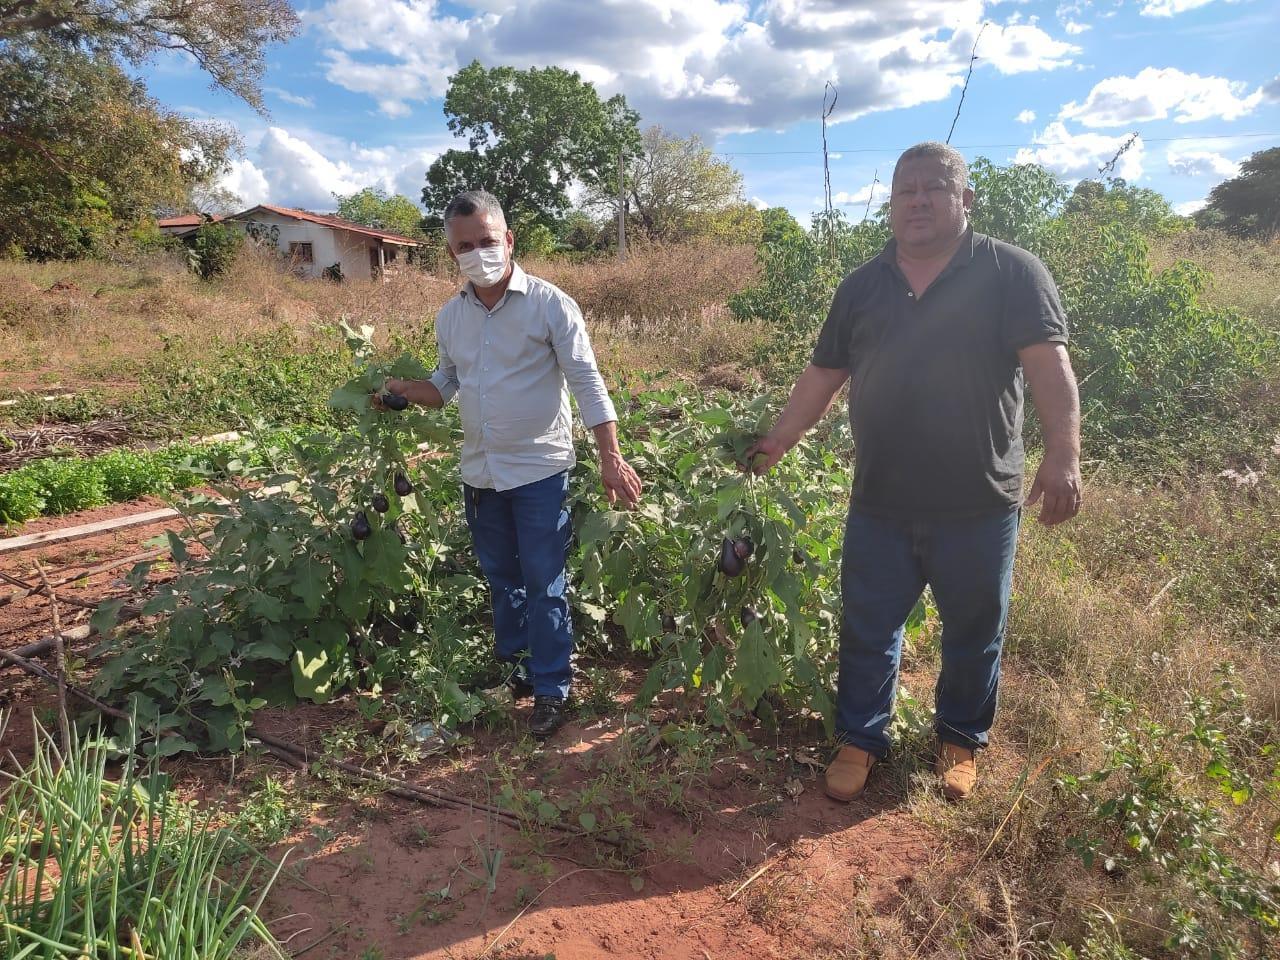 Prefeitura entrega 20 toneladas de adubo do tipo cama de frango para os pequenos produtores de Angico